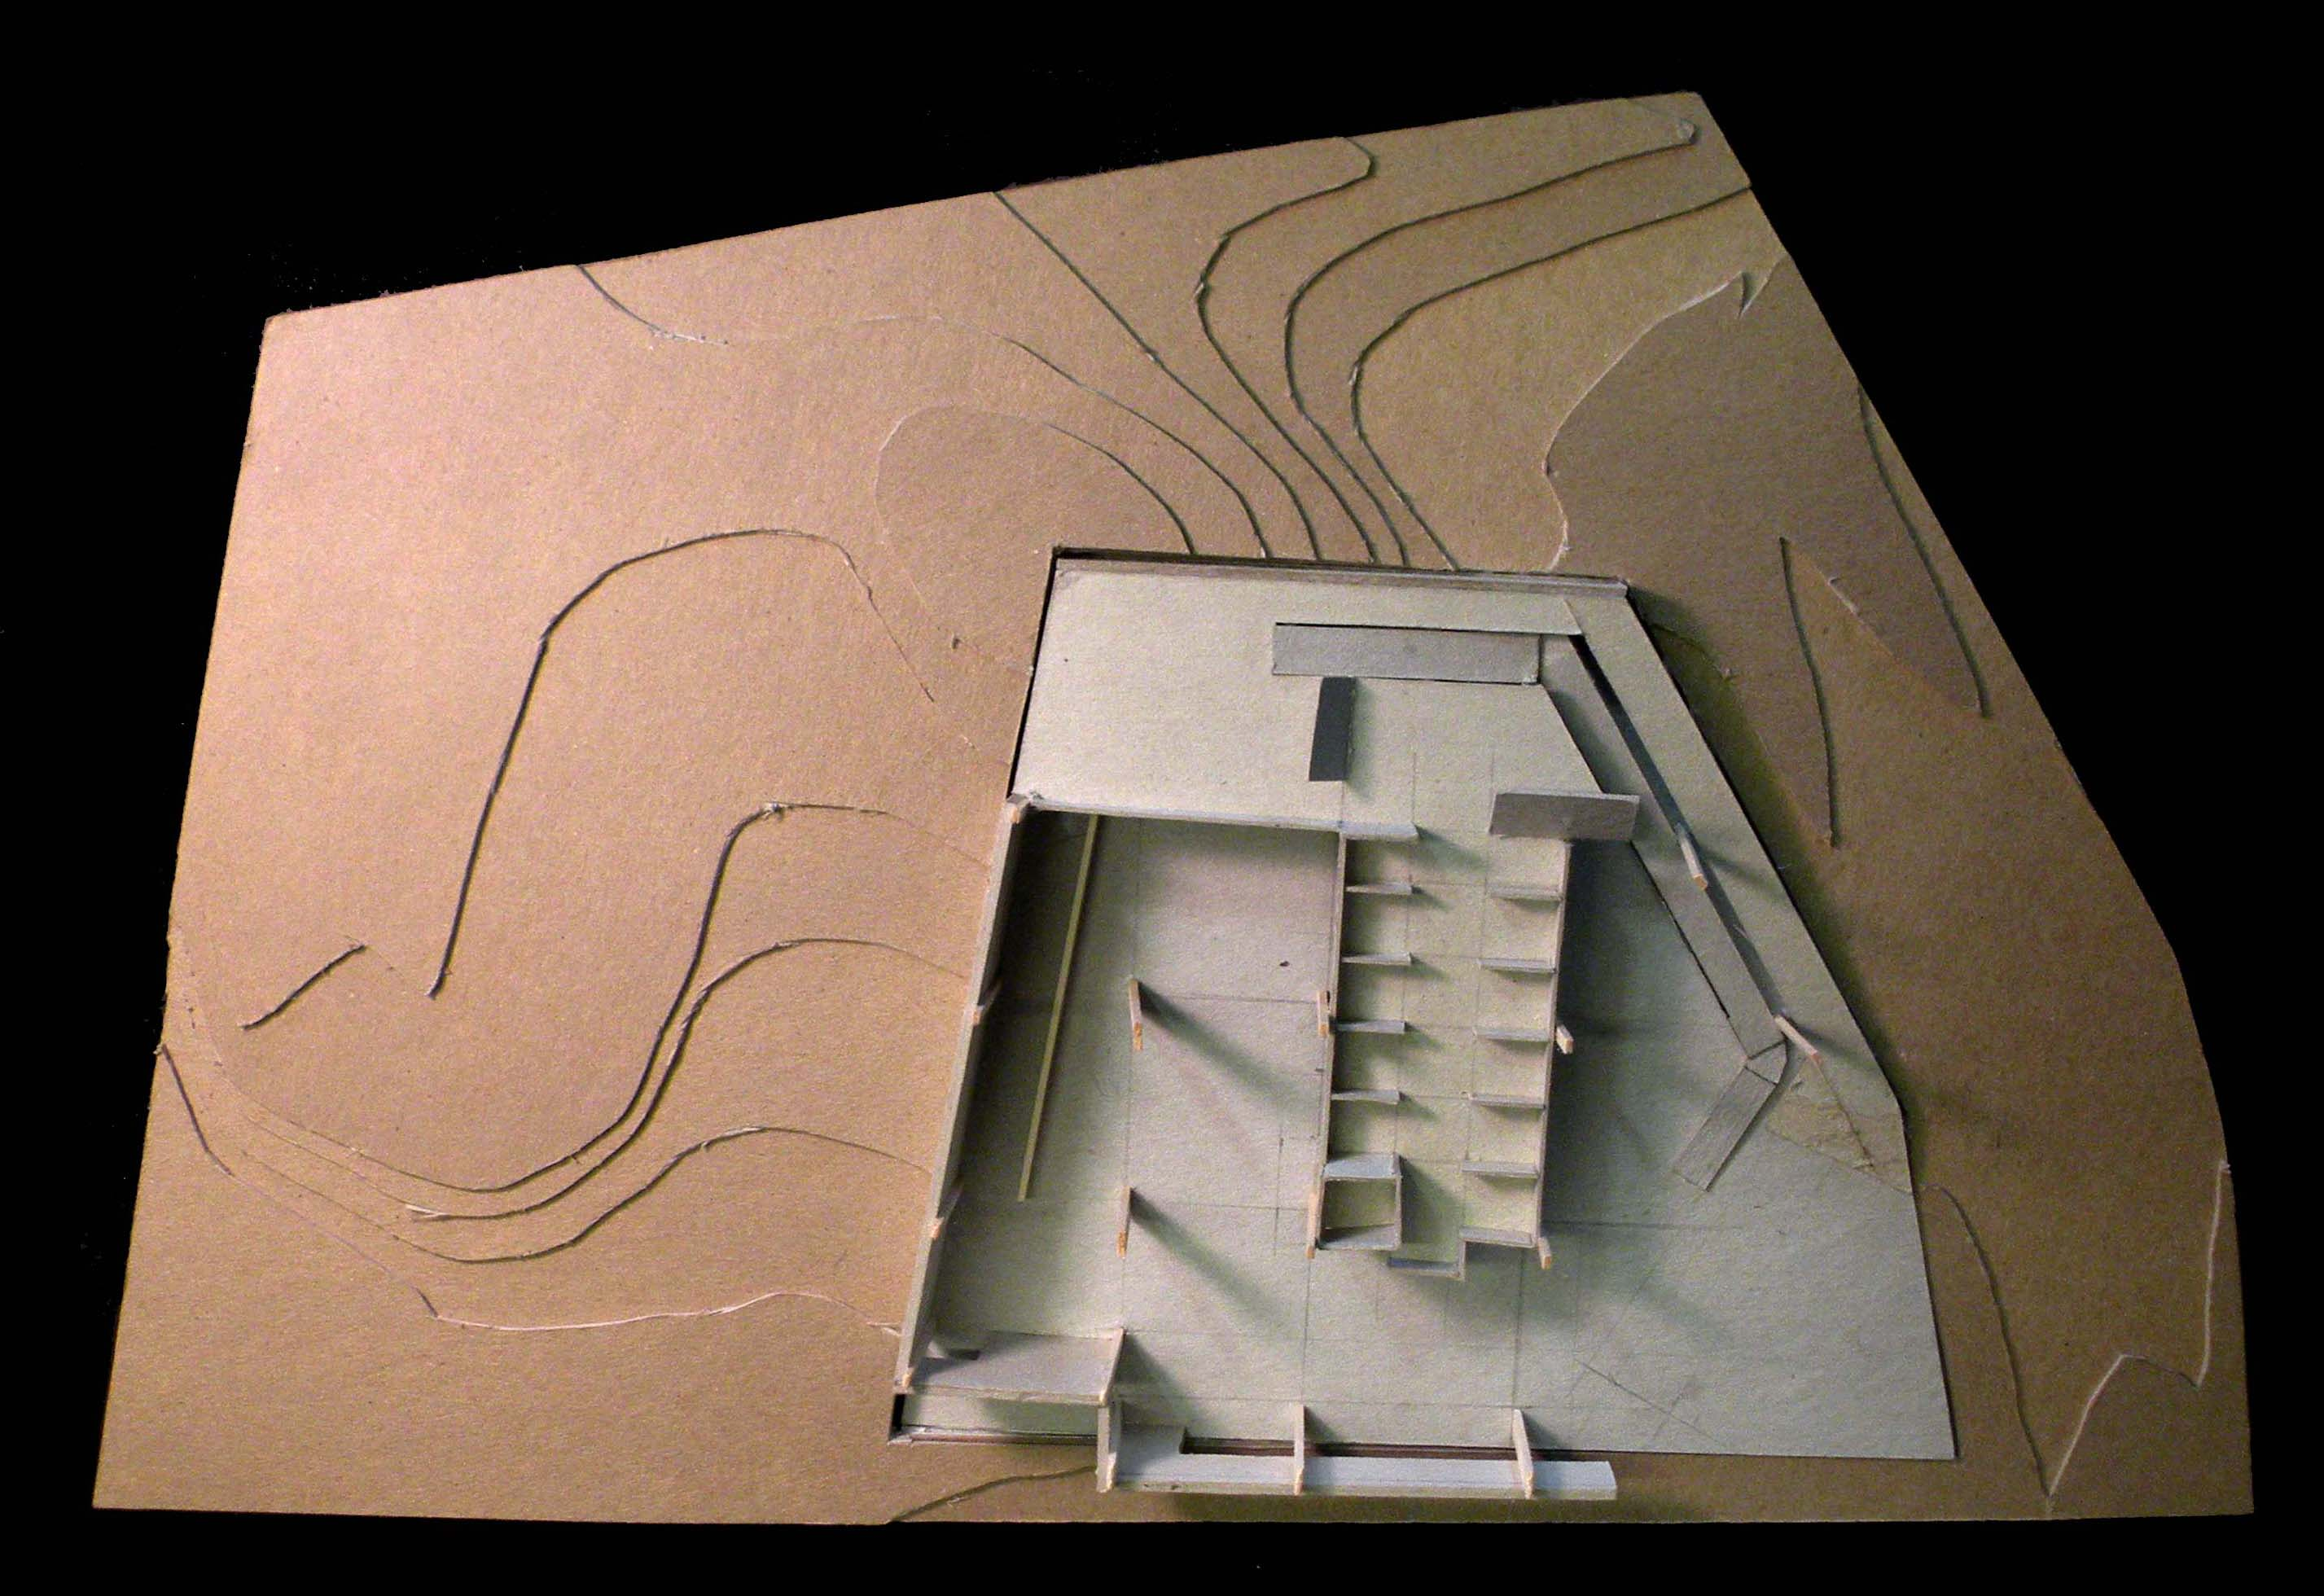 Spatial Model in Topography